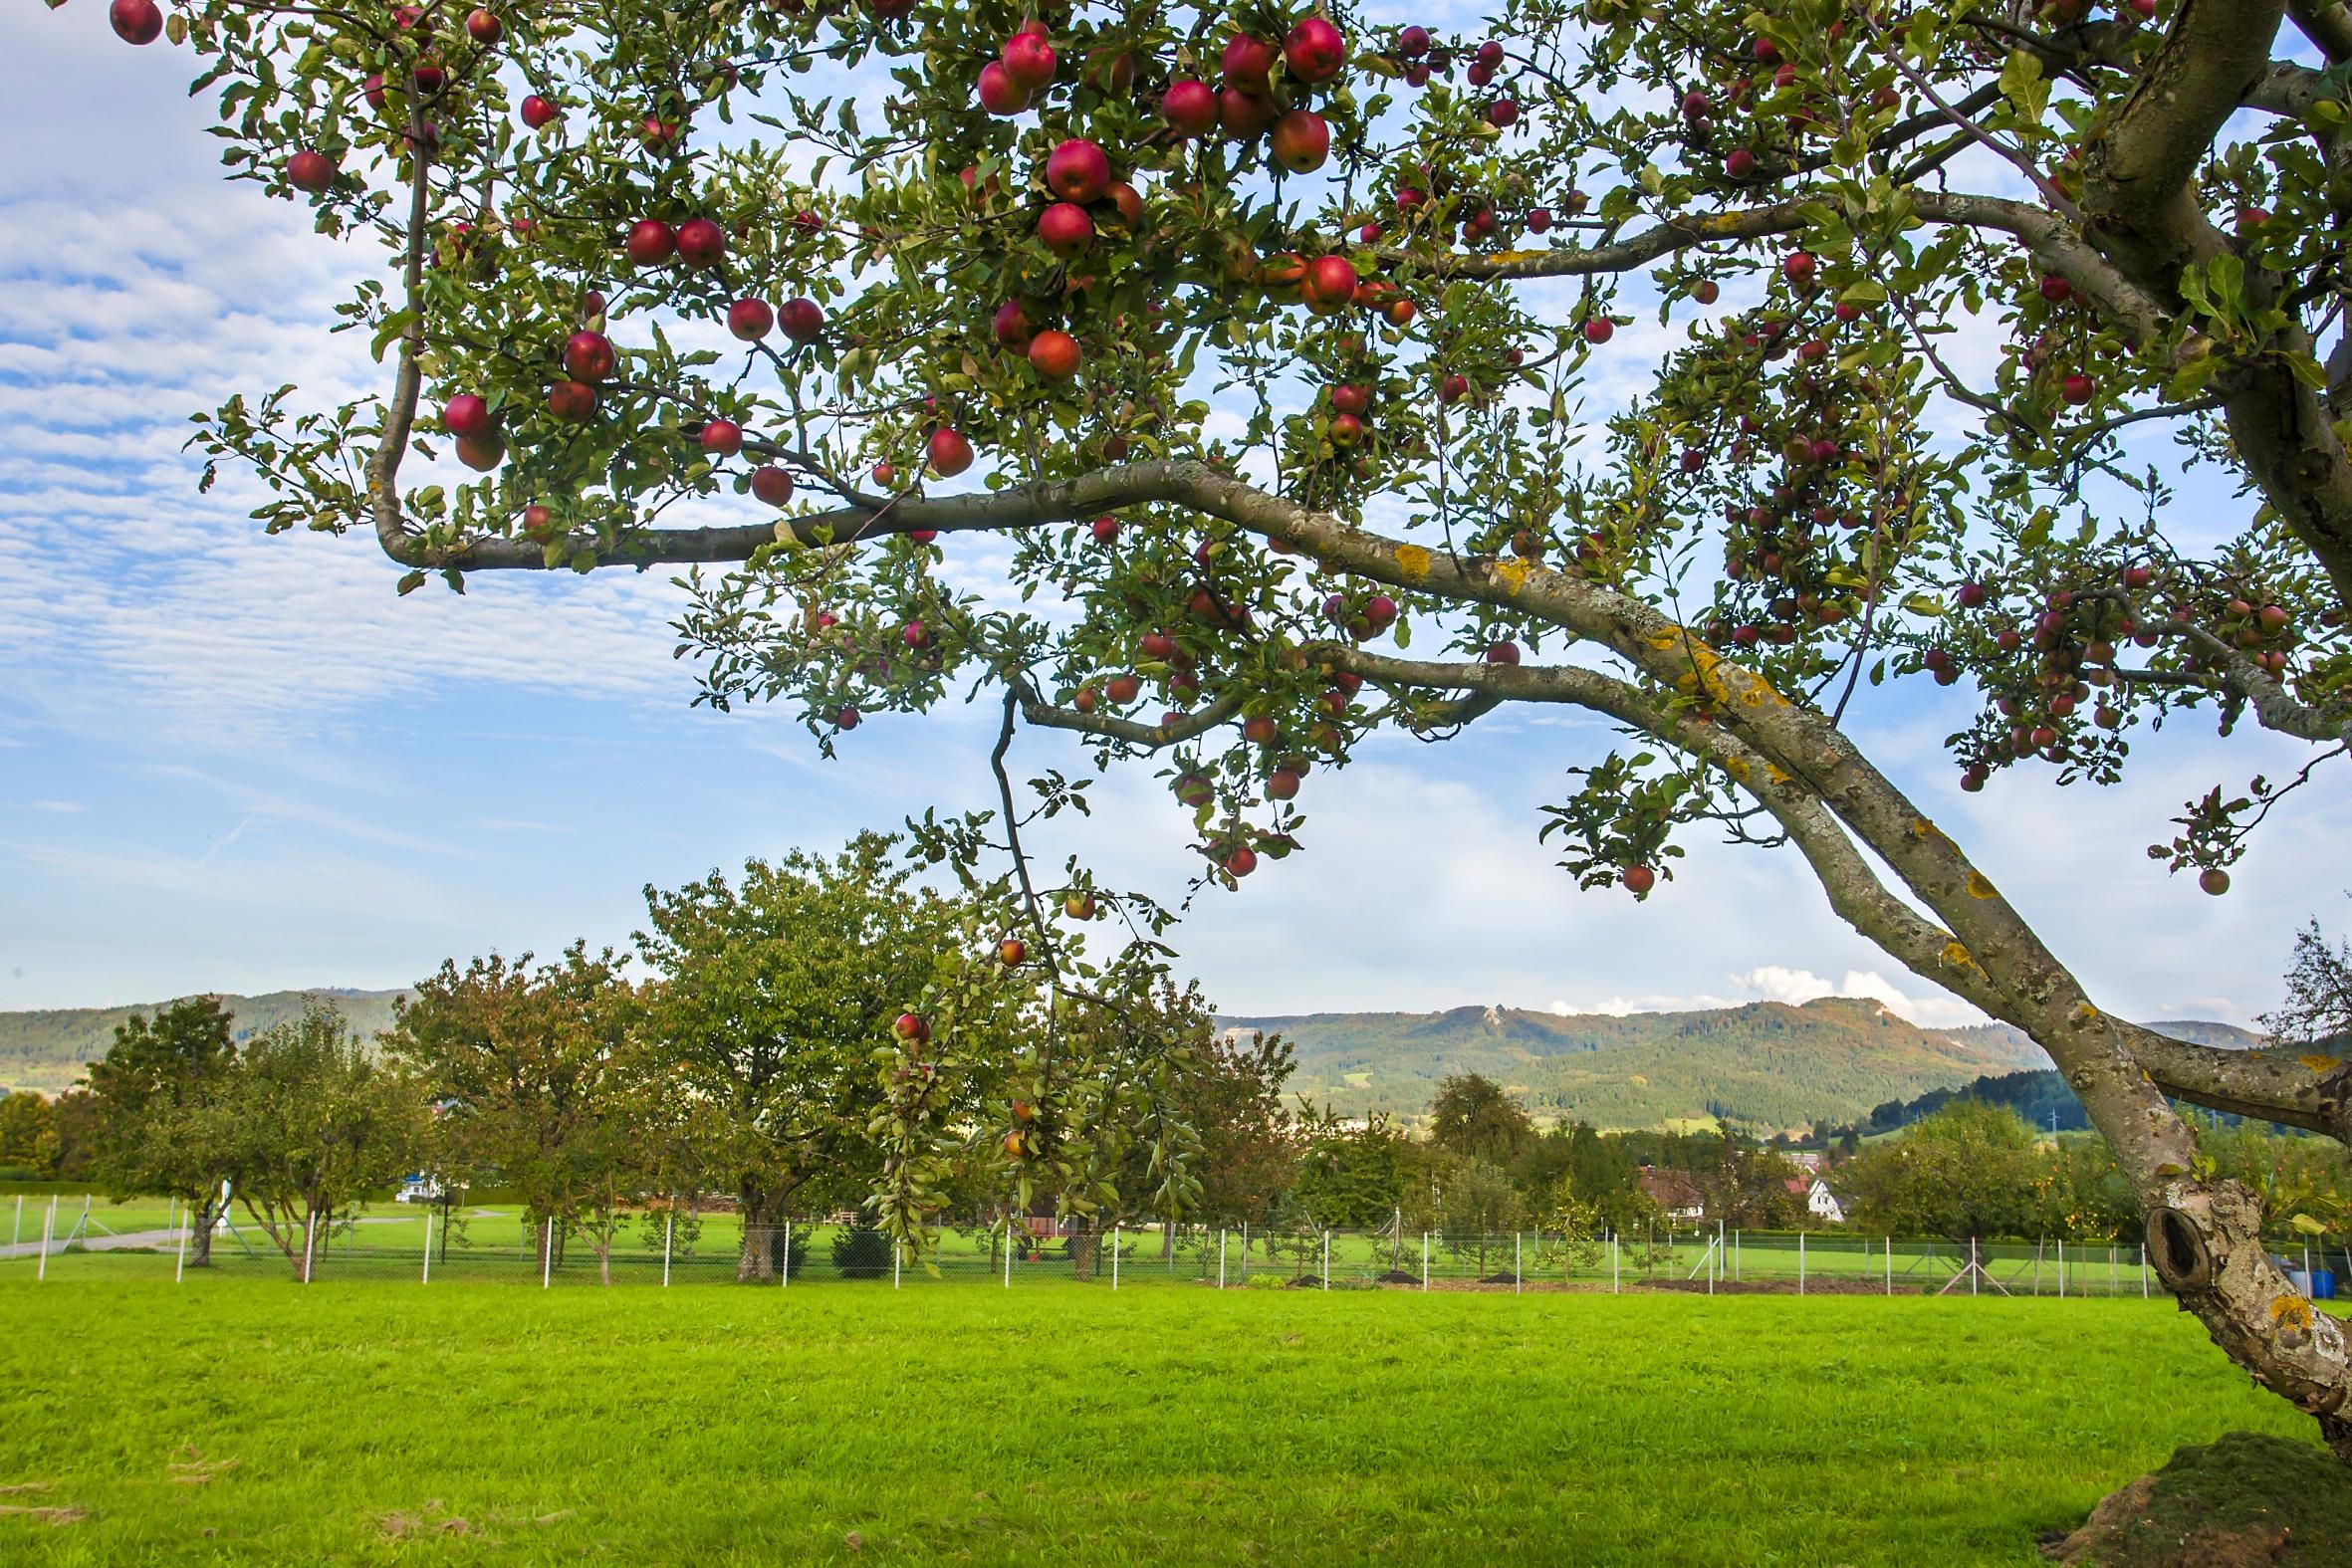 Obstbäume bei Weilstetten